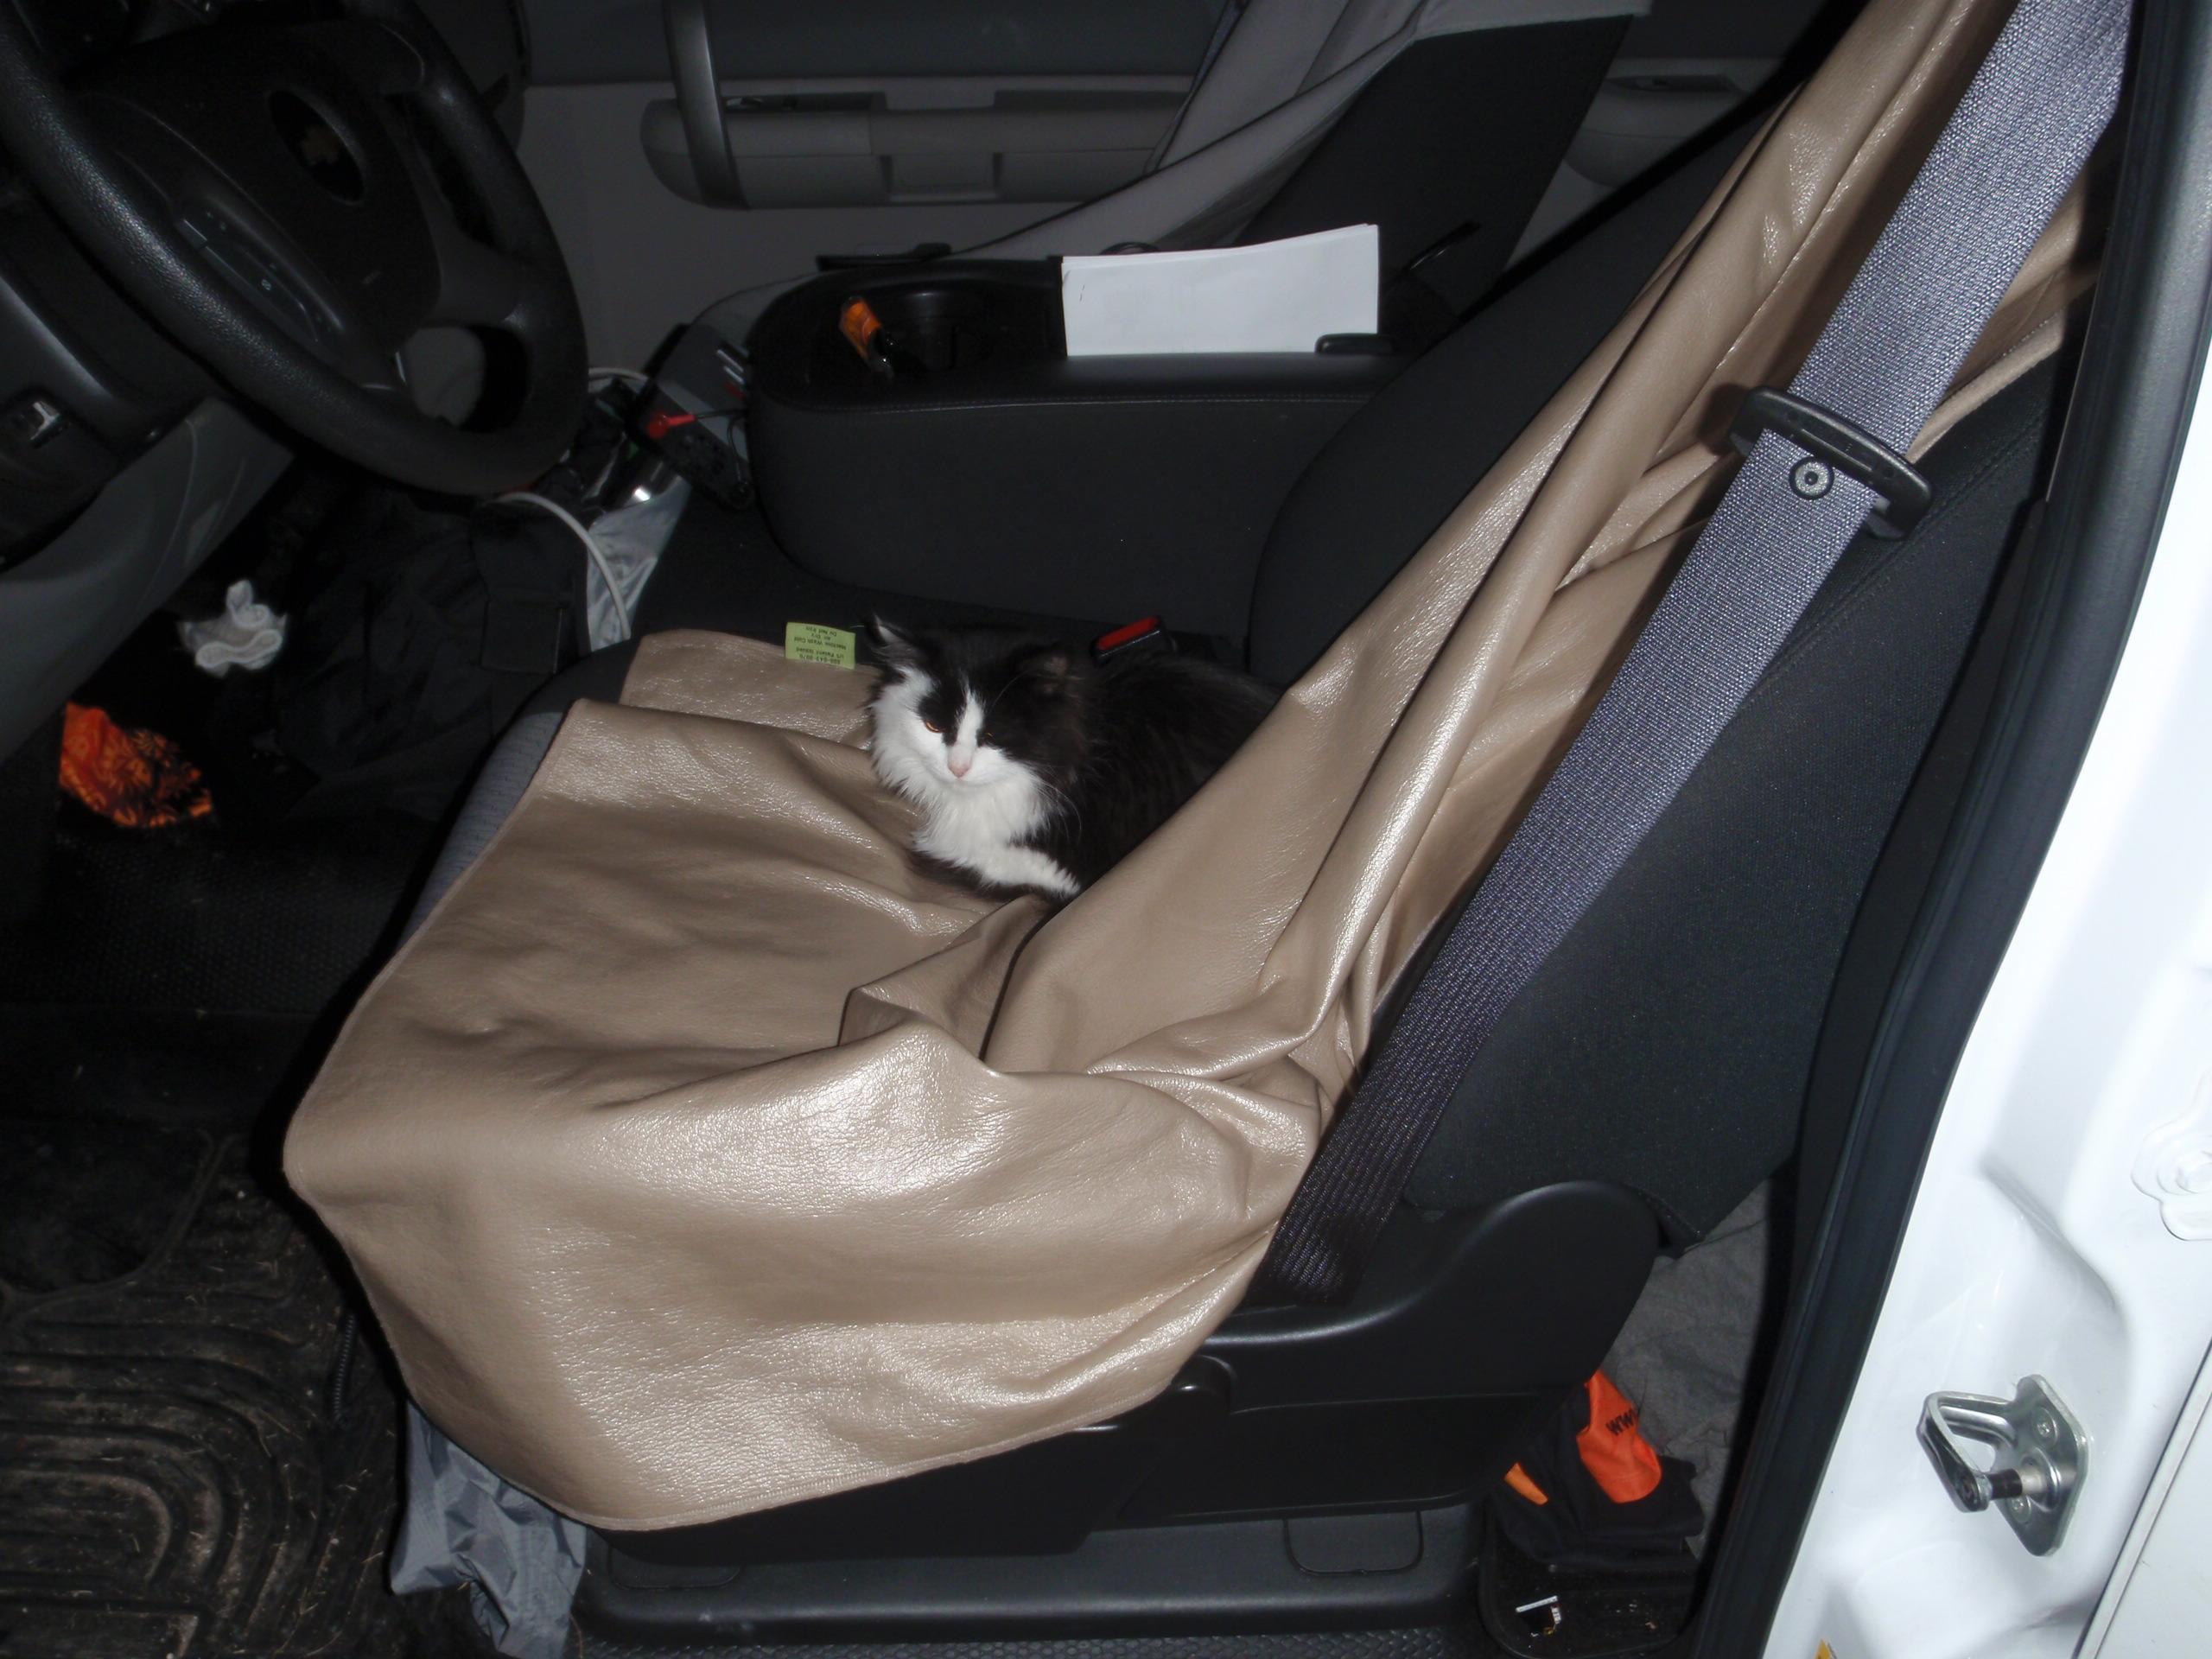 The TATUR cat, has assumed Weeble's post!